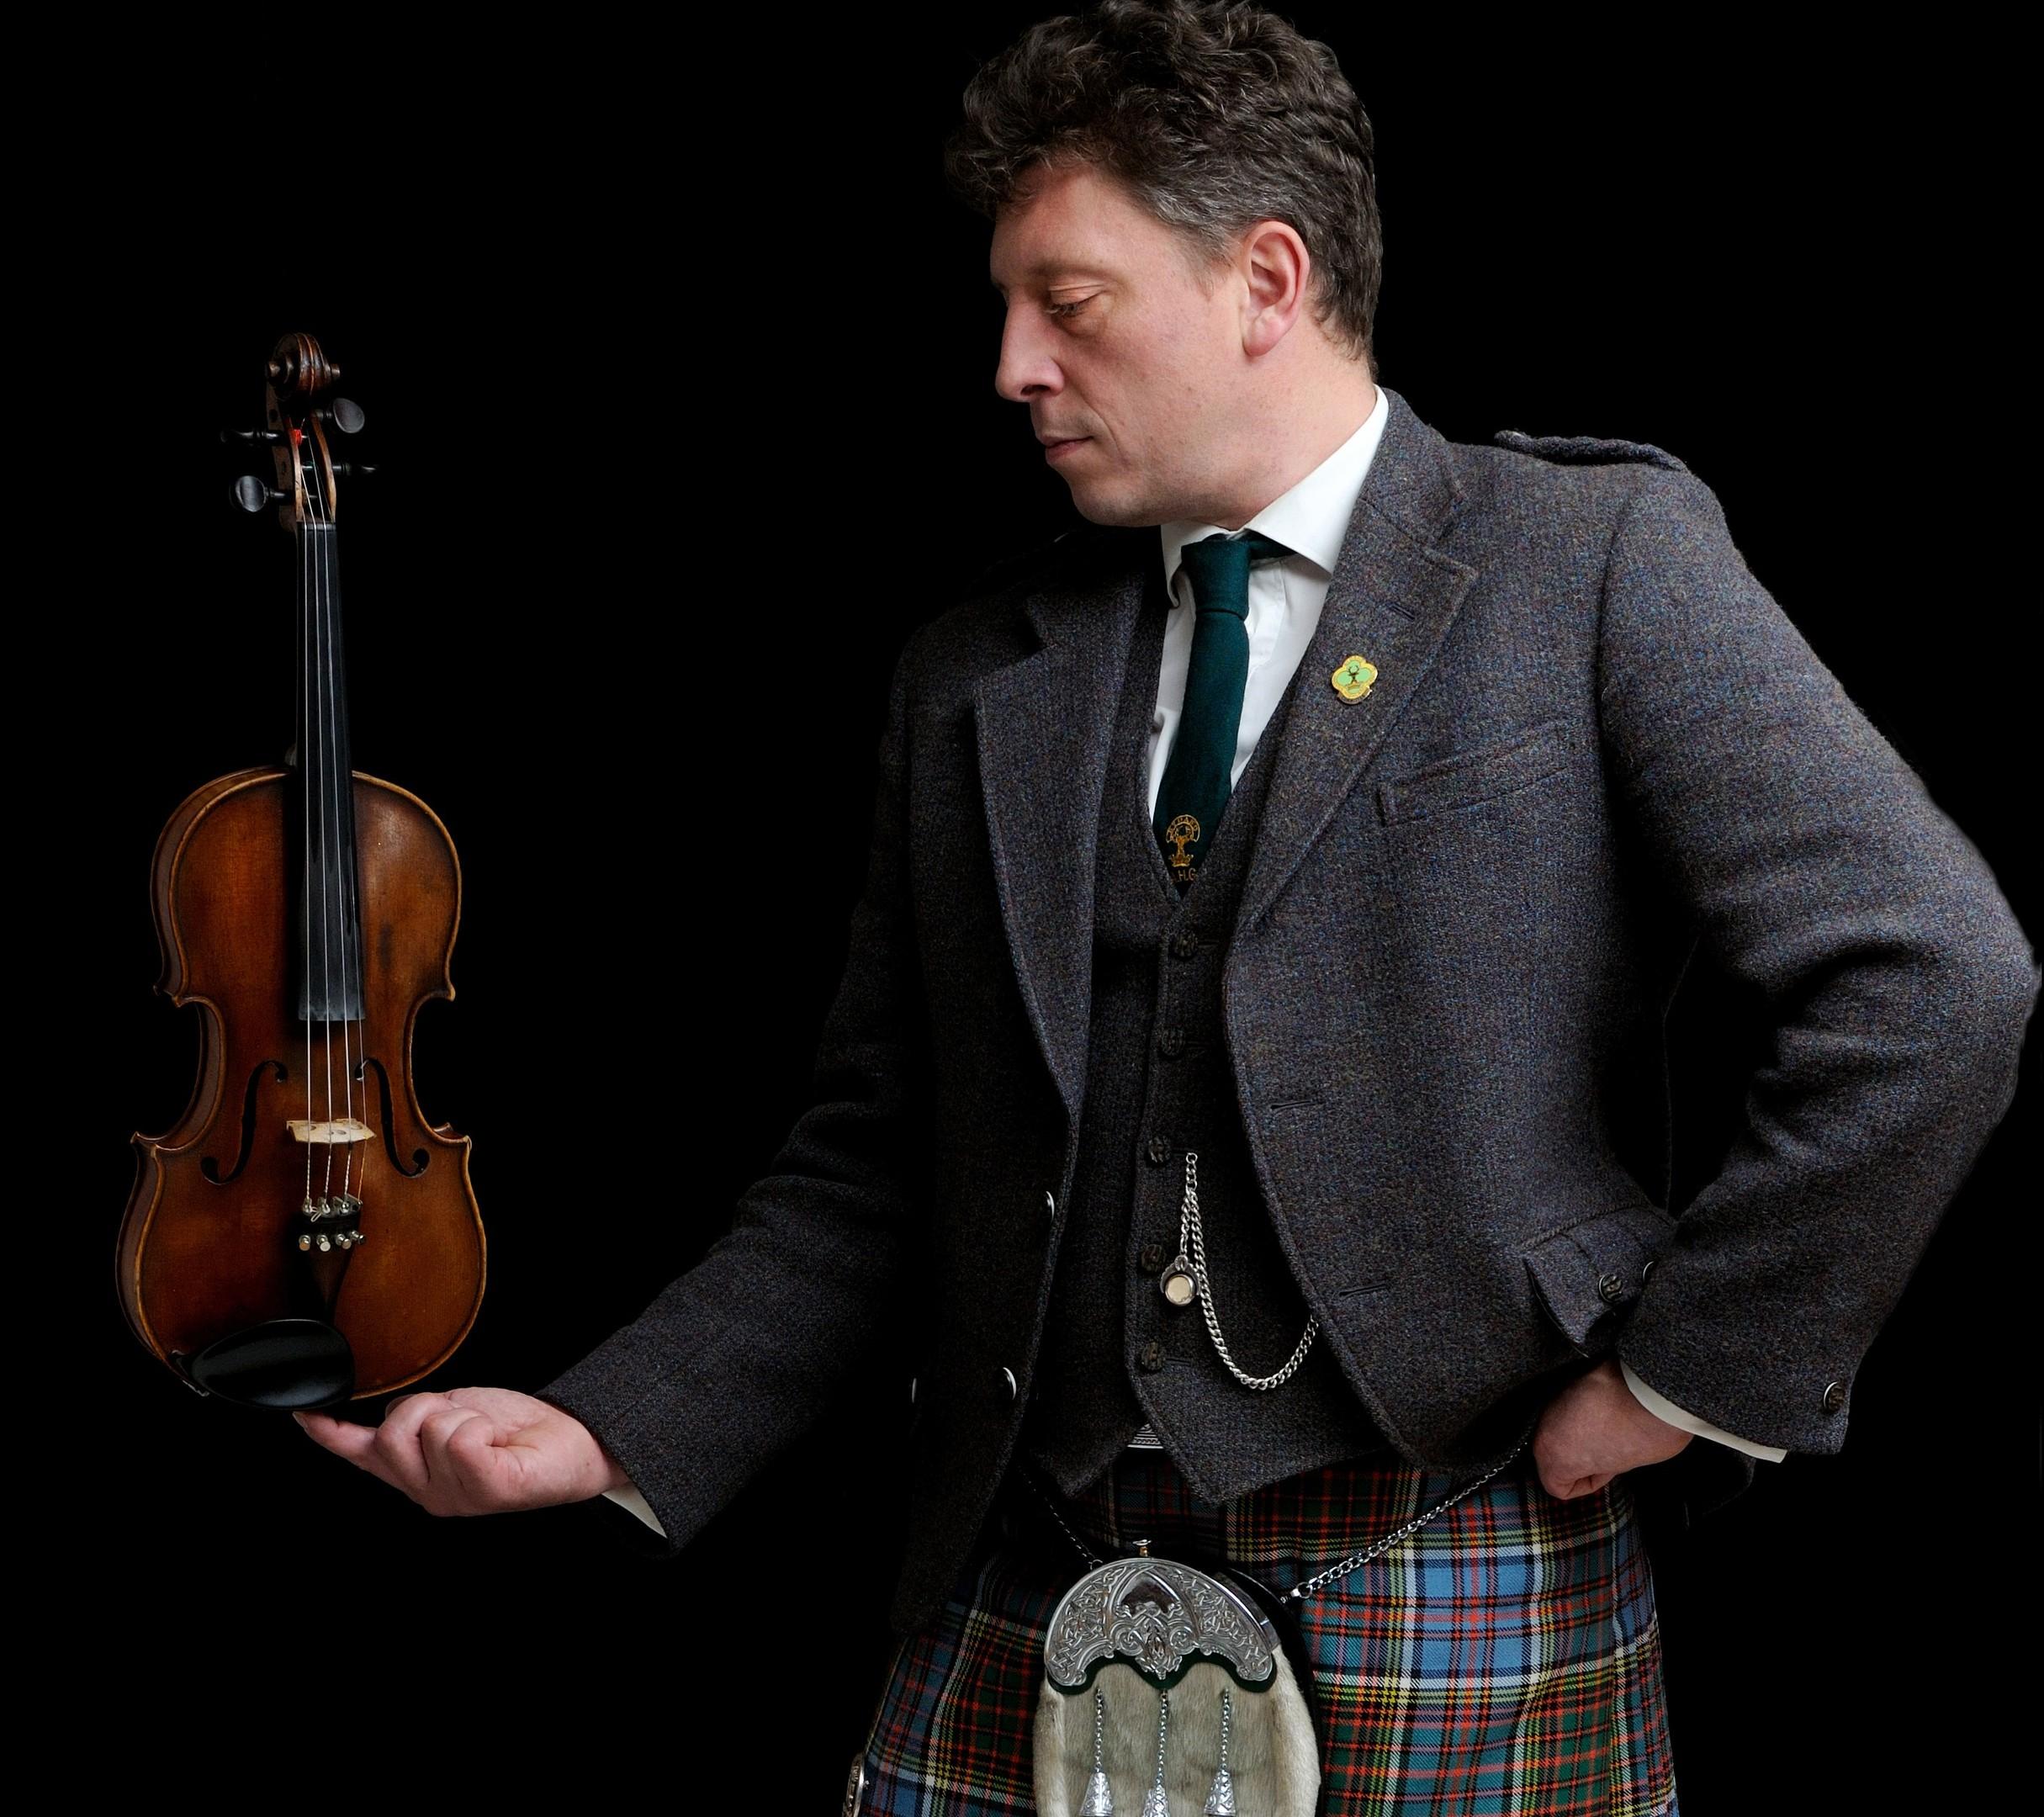 Tarland fiddler Paul Anderson